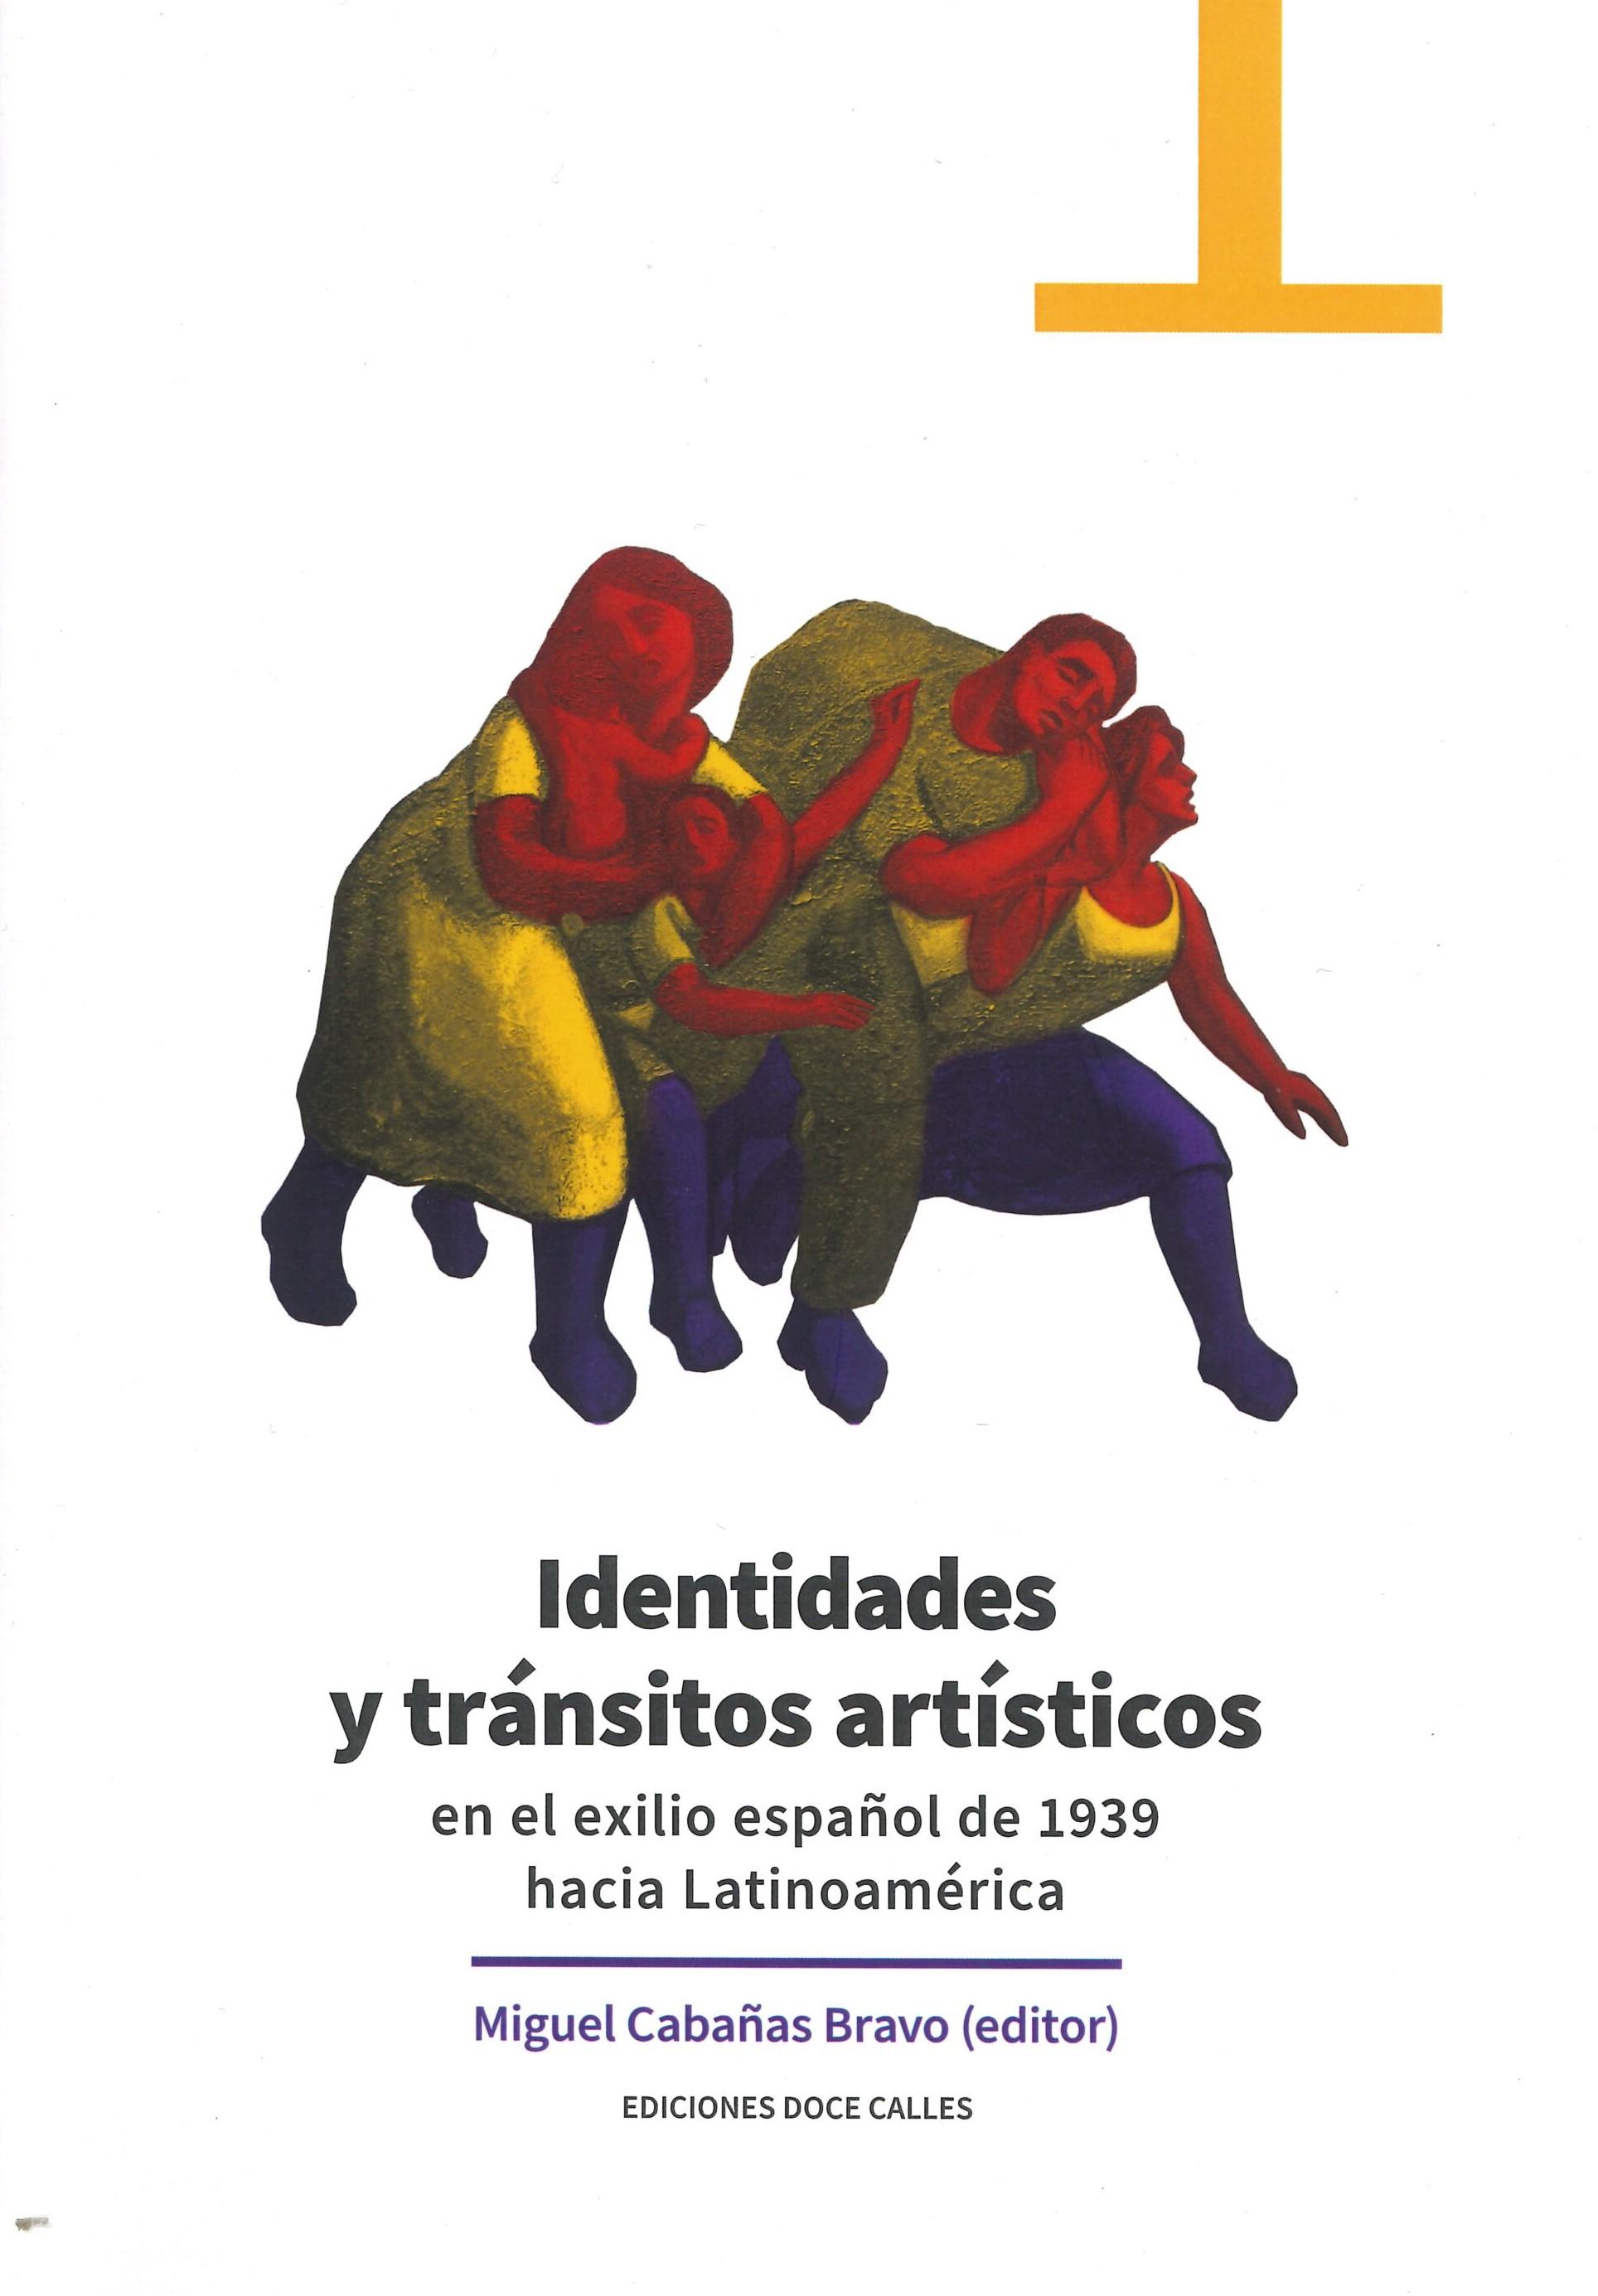 identidades_y_transitos.jpg